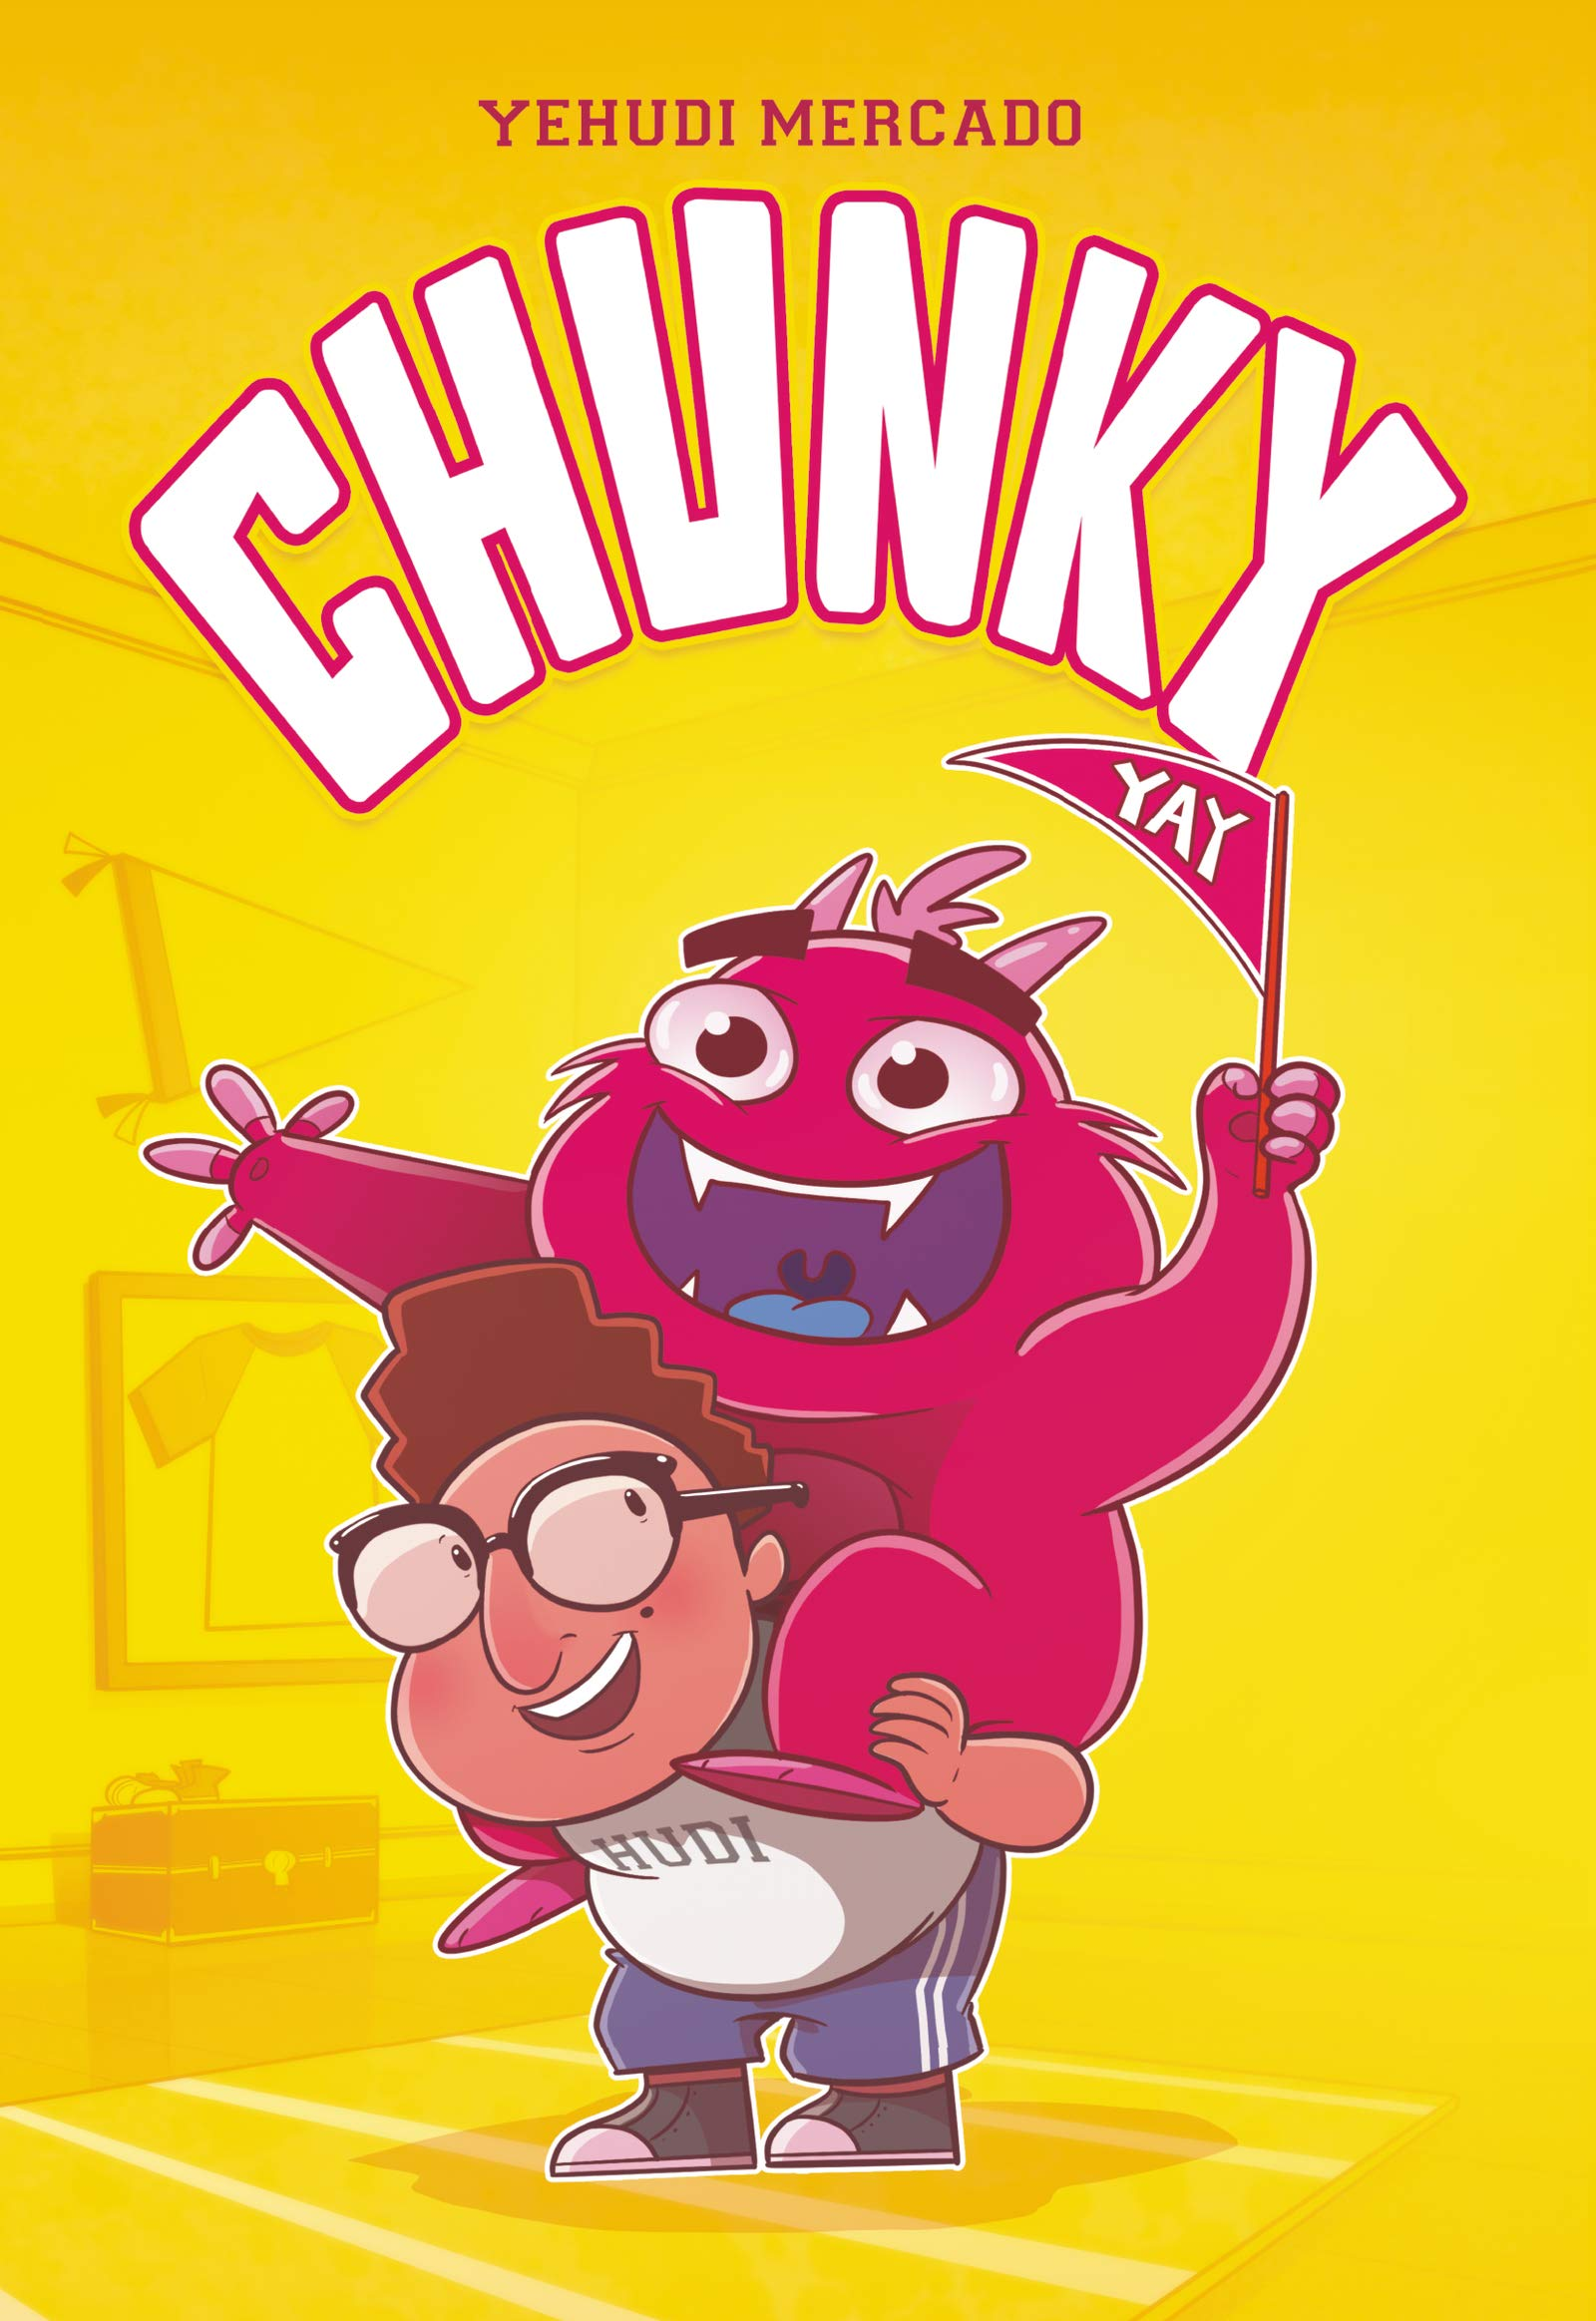 Chunky: Mercado, Yehudi, Mercado, Yehudi: 9780062972781: Amazon.com: Books